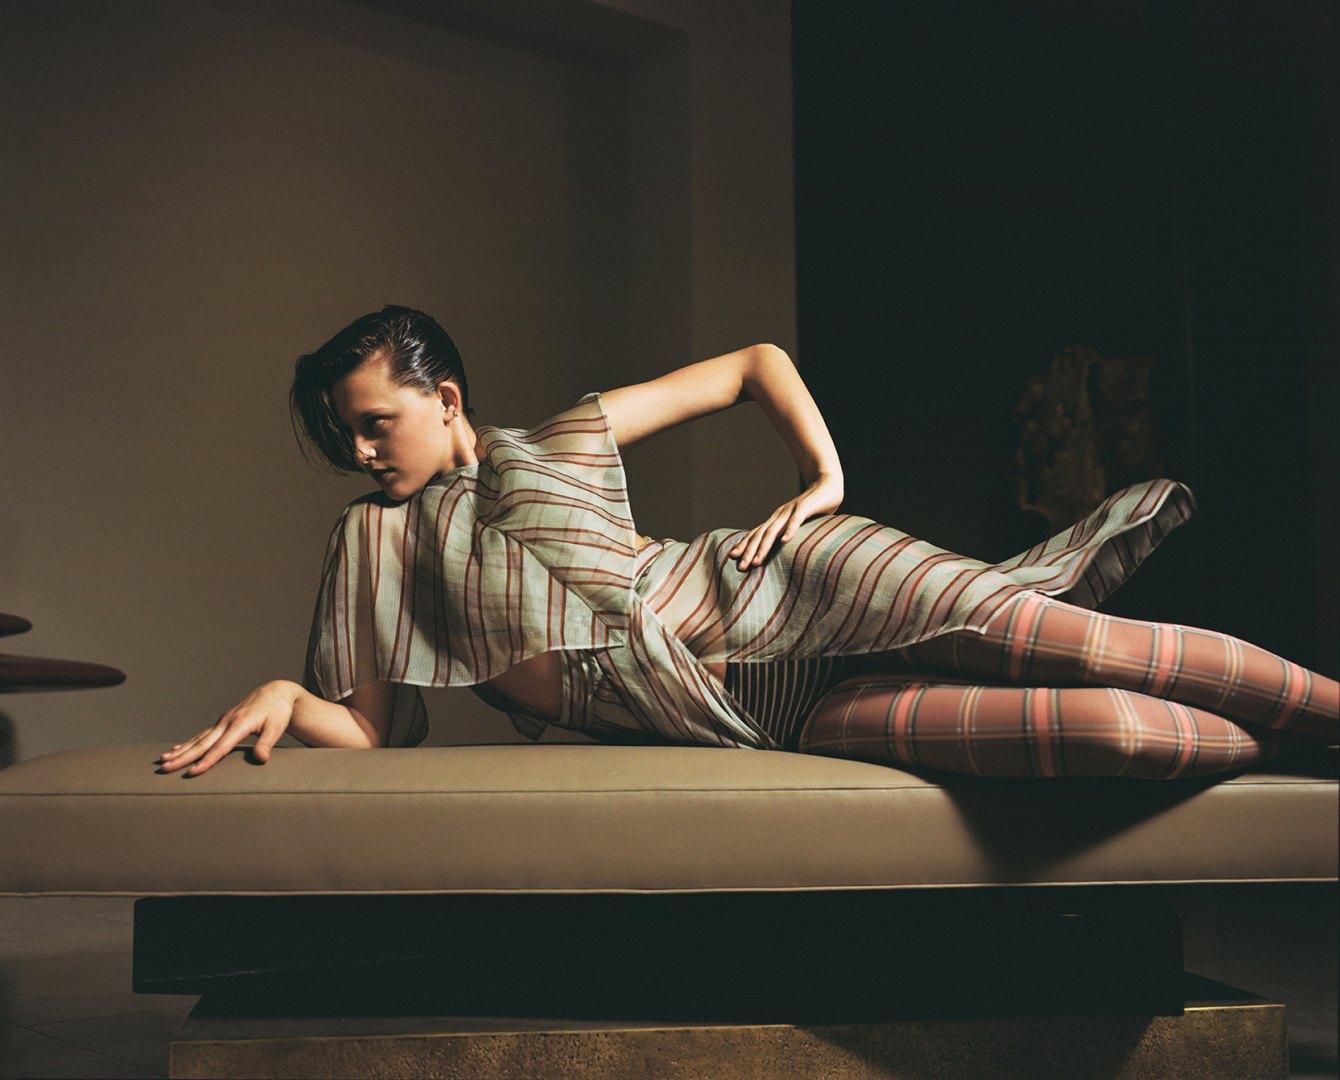 Stephanie Pfaender Body language Photo Nr.5 for Mixt(e) Magazine